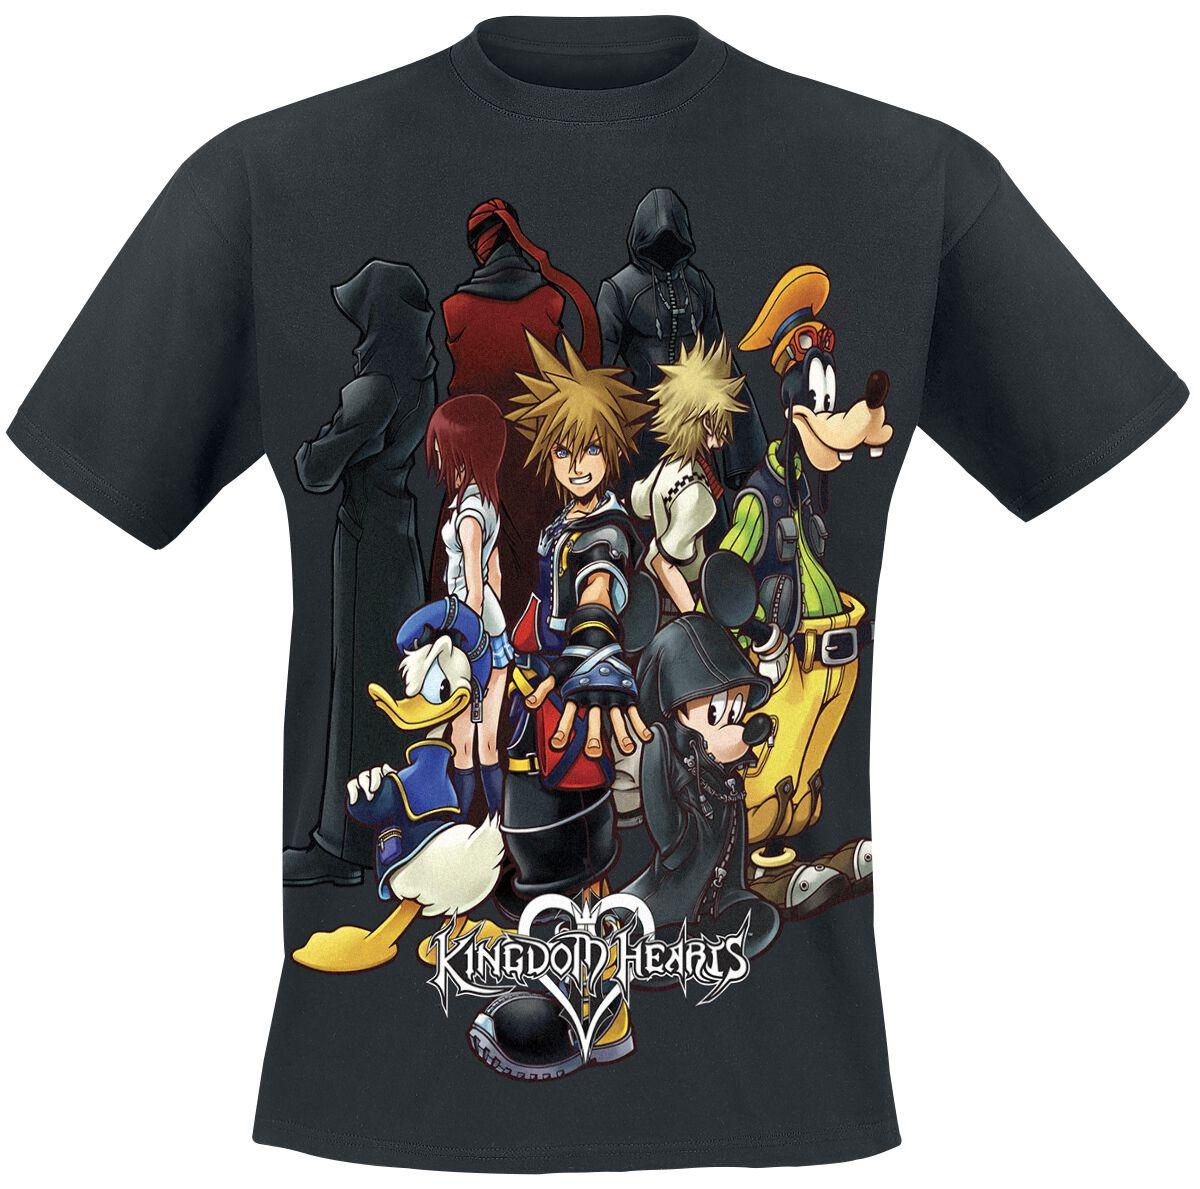 Hearts Group   Kingdom Hearts T-Shirt   EMP